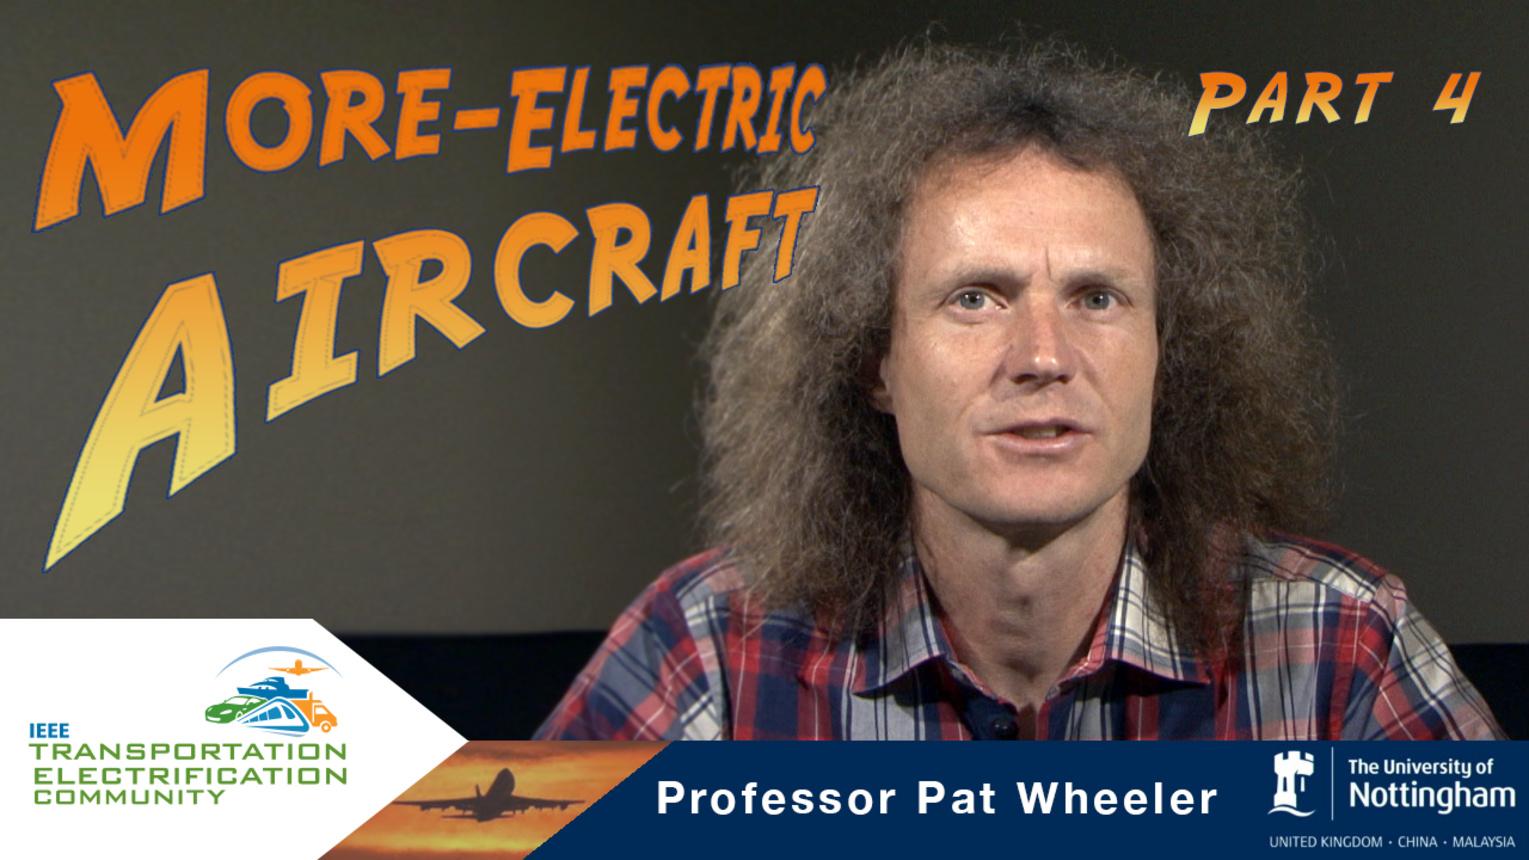 ECCE-2015- Pat Wheeler - More Electric Aircraft - Part 4